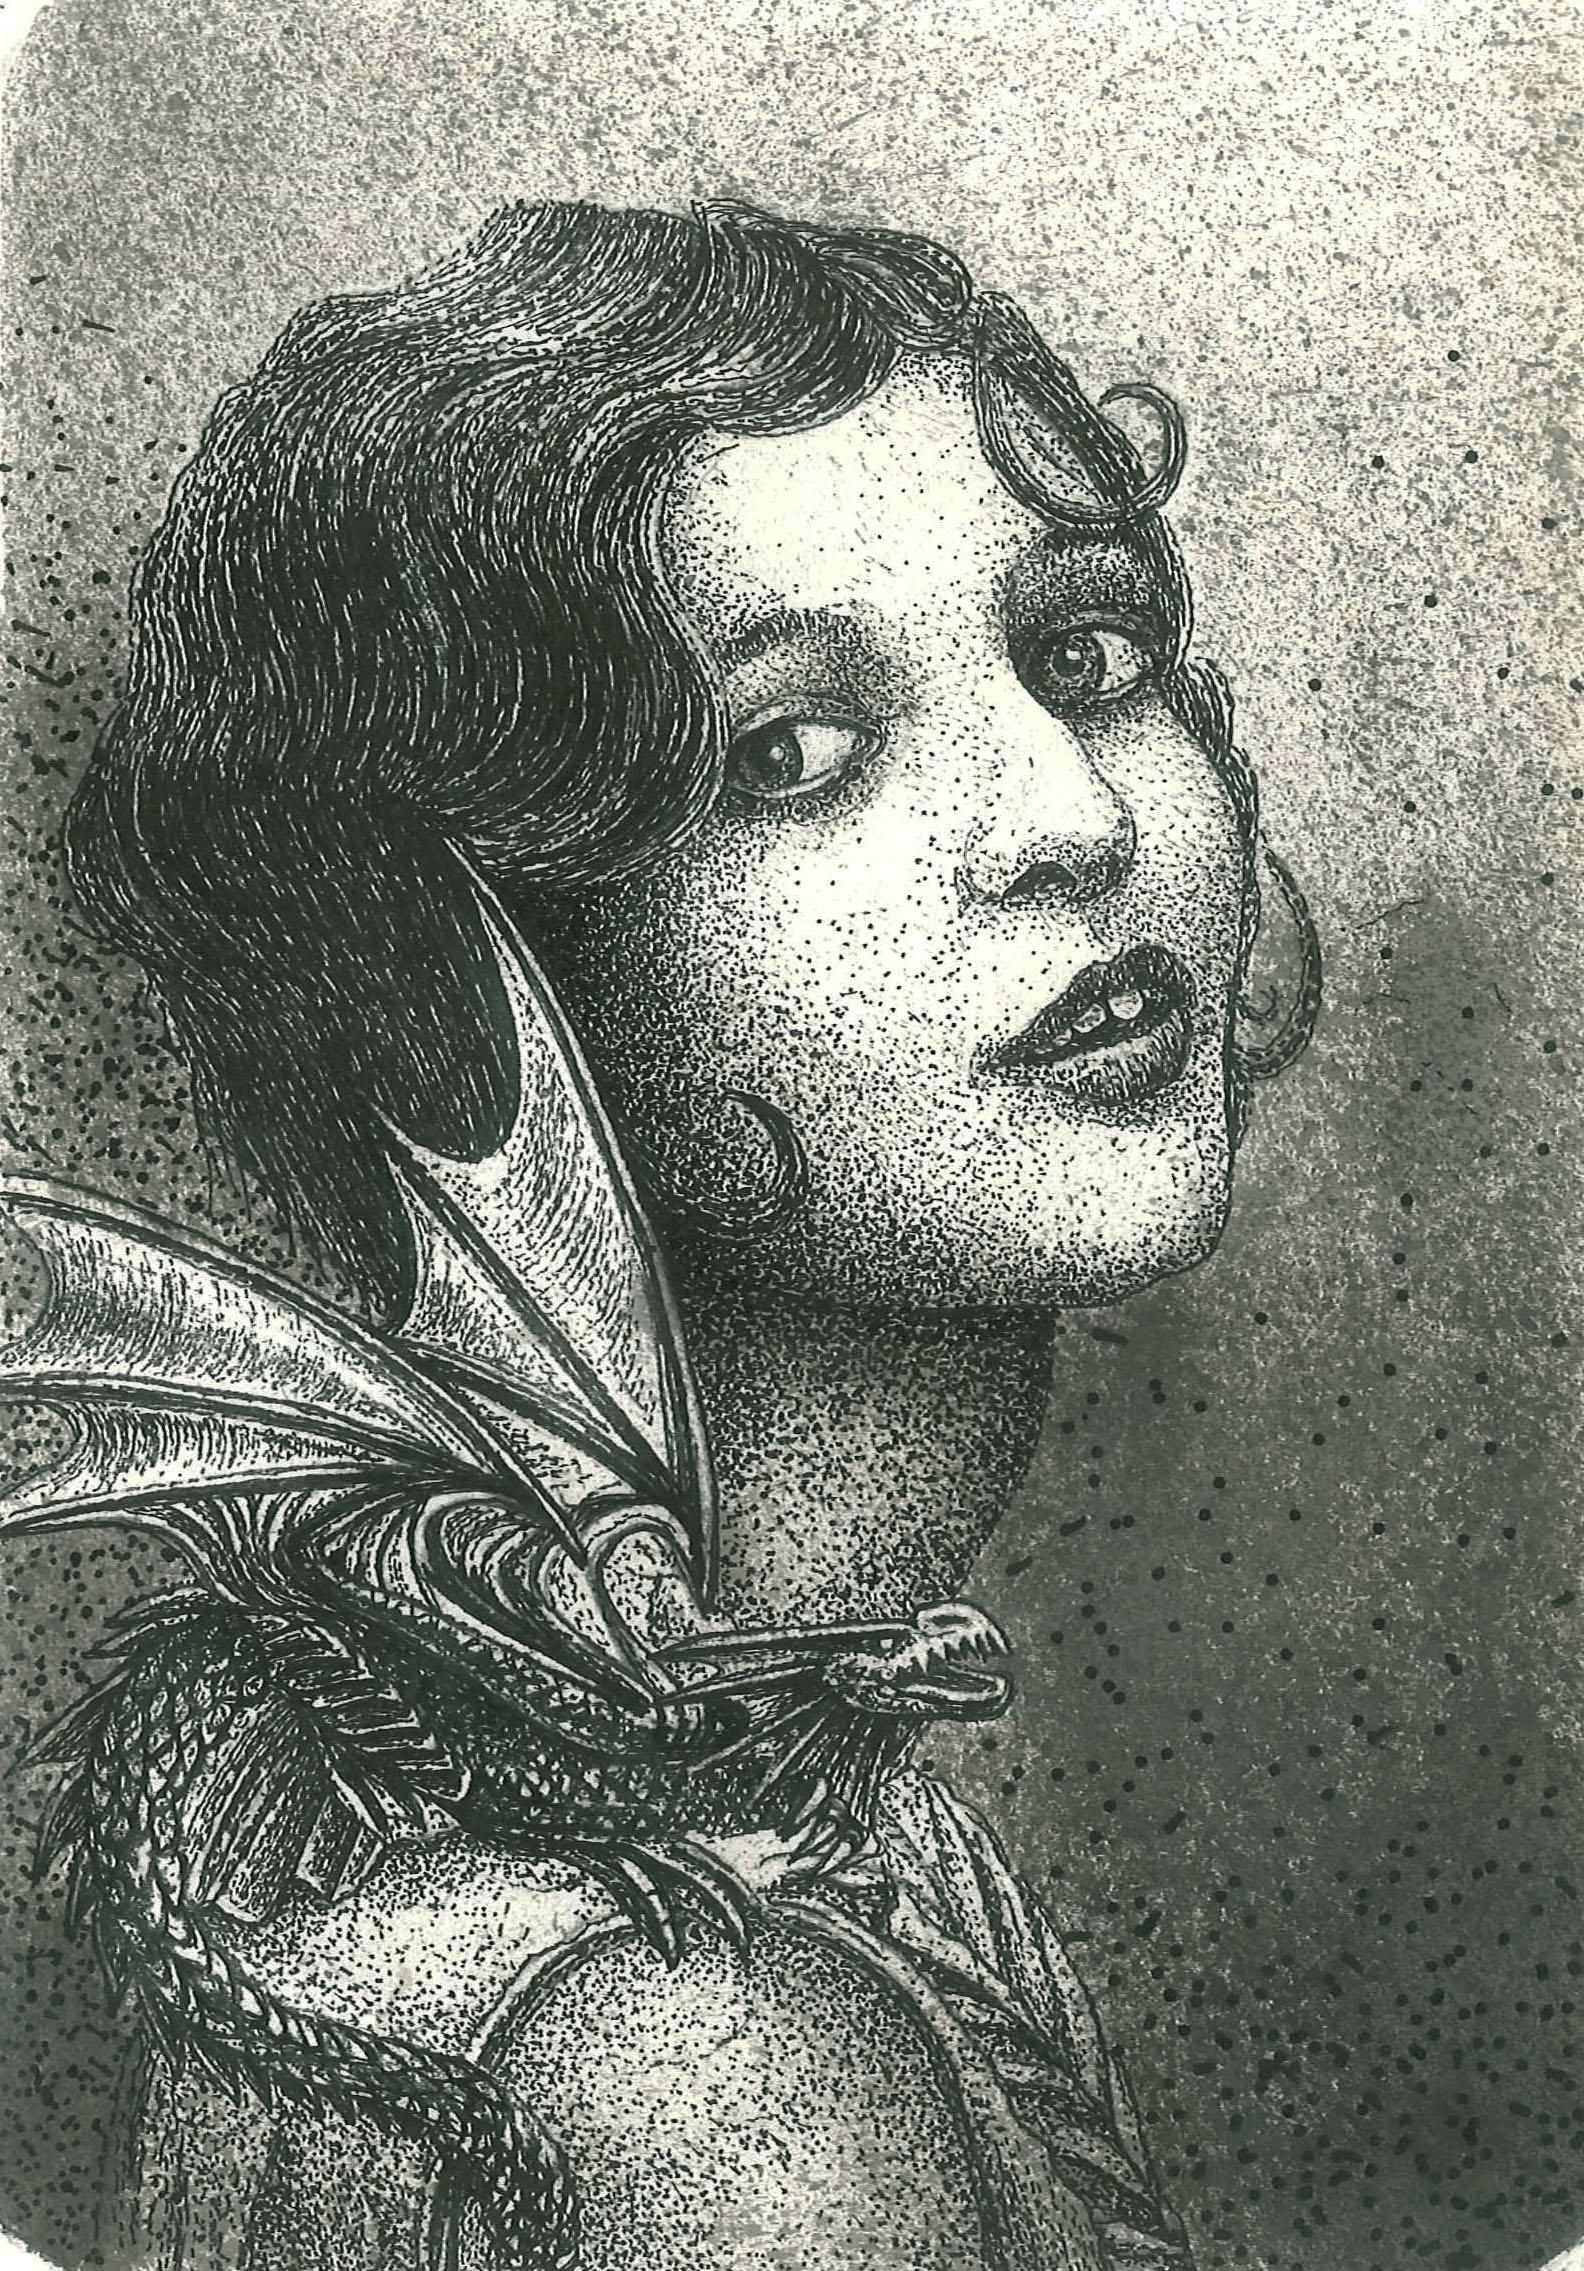 KROMA/Leonidas Giannakopoulos, Dragon girl, 2017, ink on paper, 20,5x14,7cm